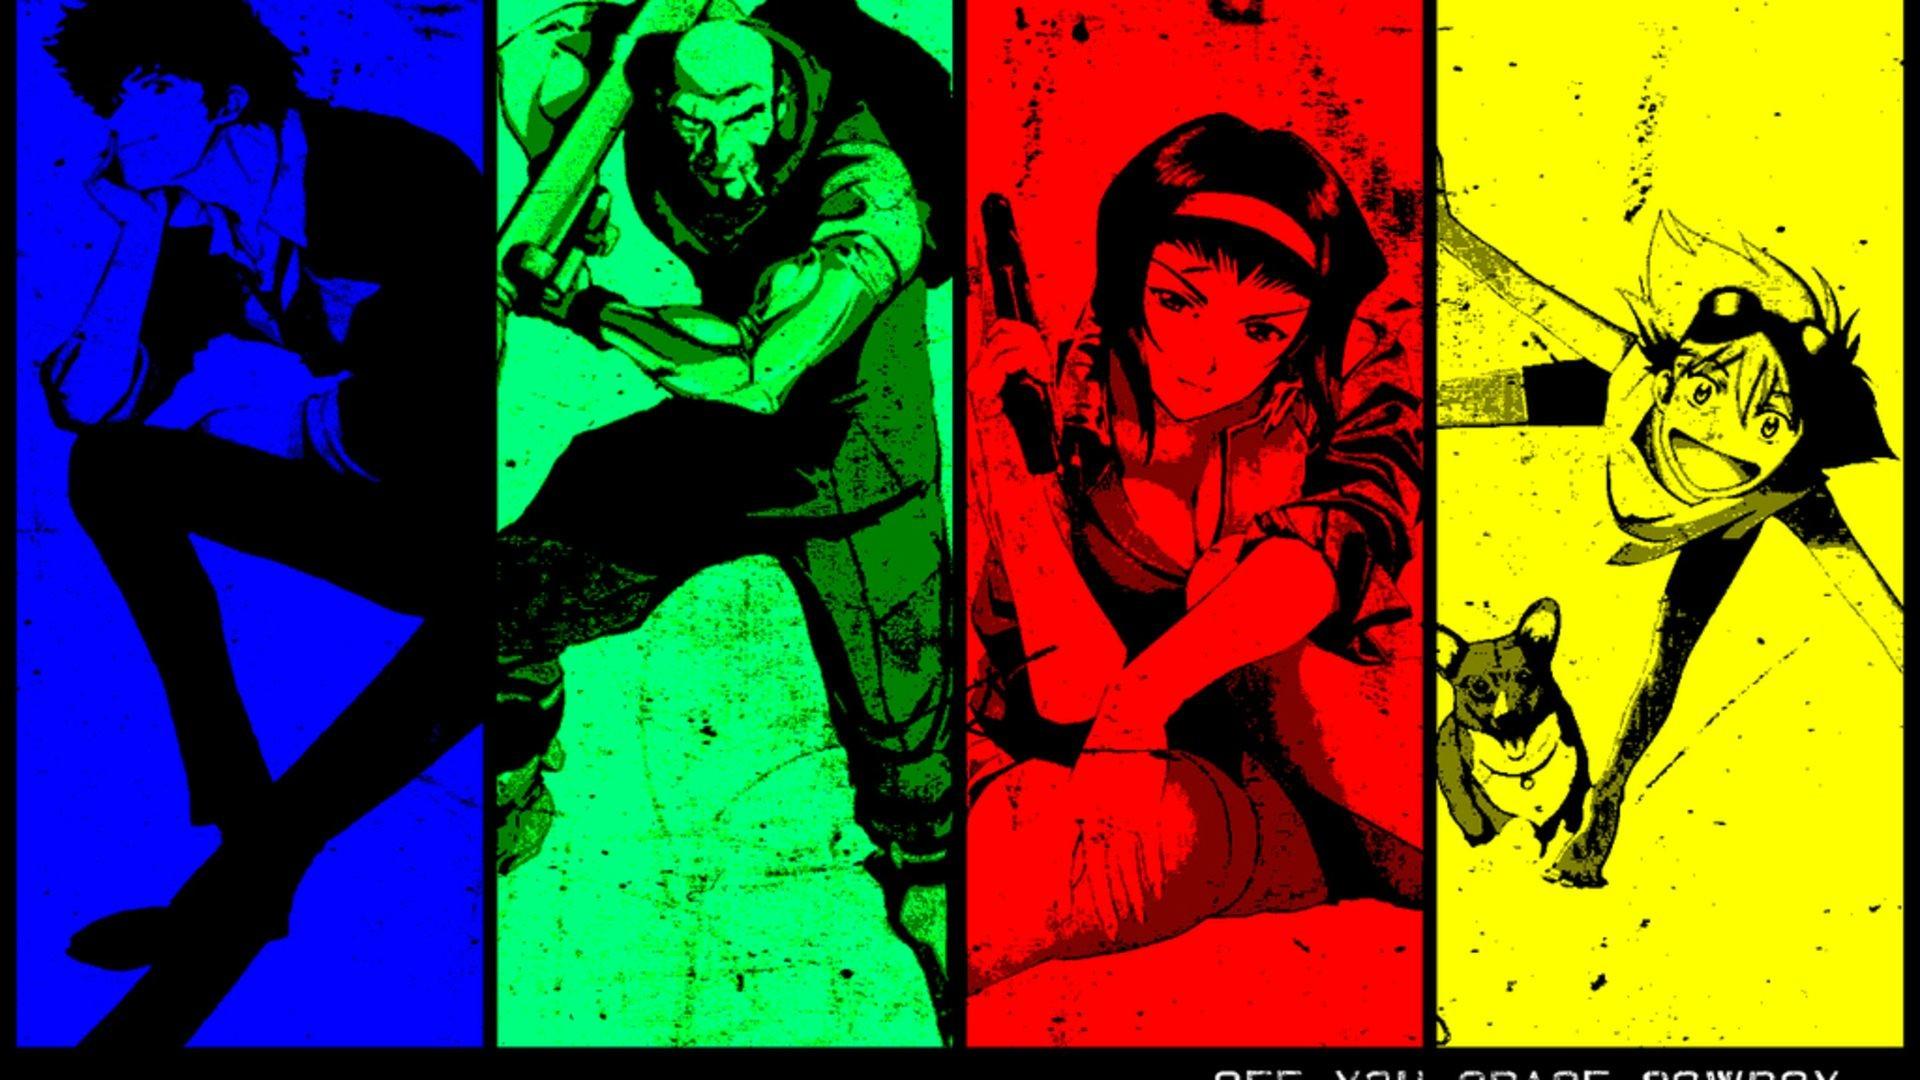 Cowboy Bebop Wallpapers Wallpapertag